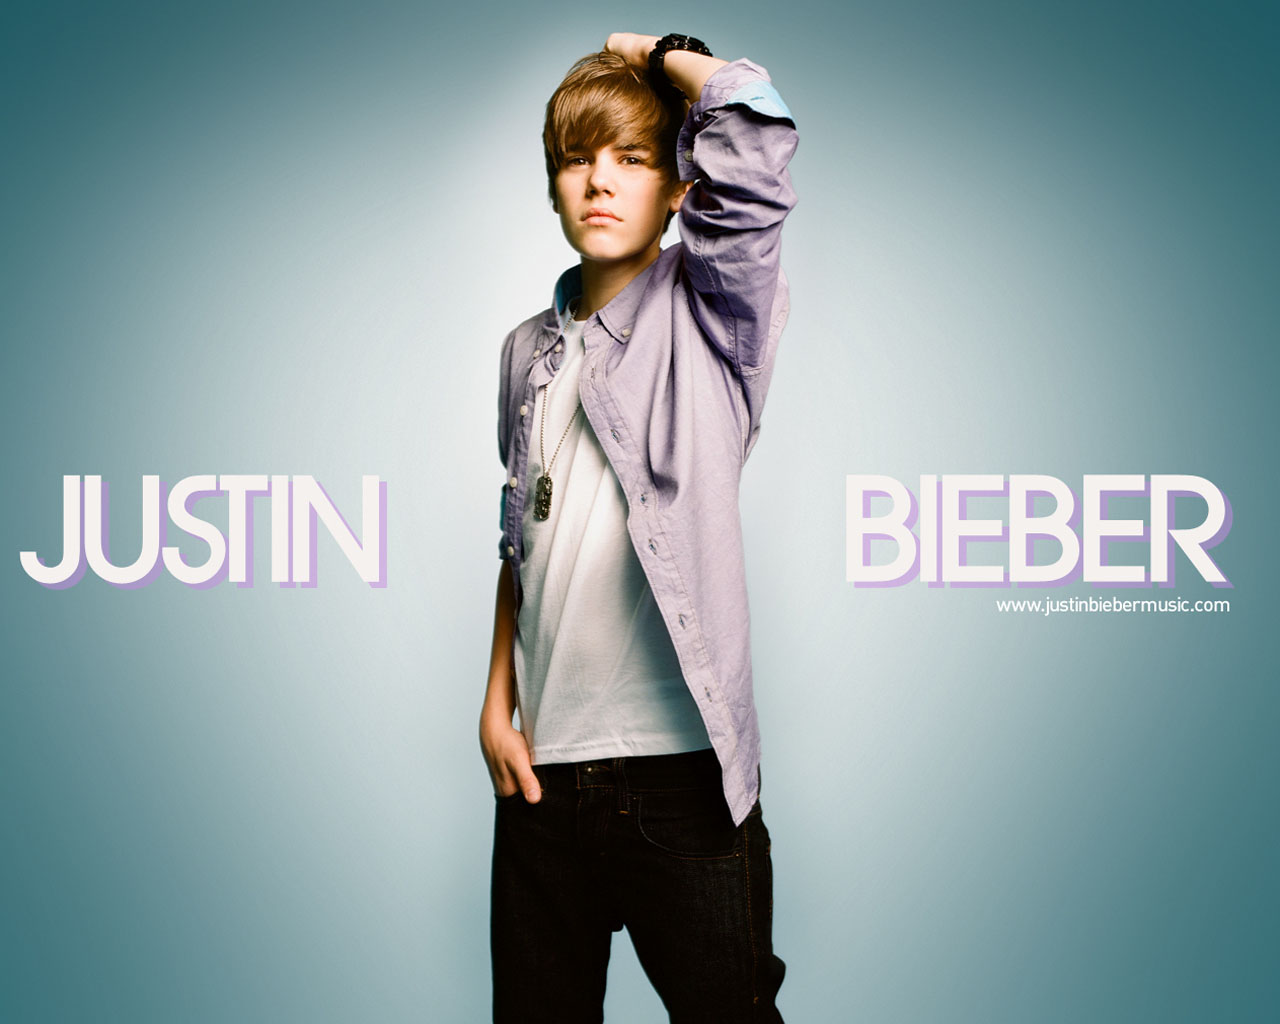 Animated Wallpaper For Tablet Justin Bieber Wallpaper